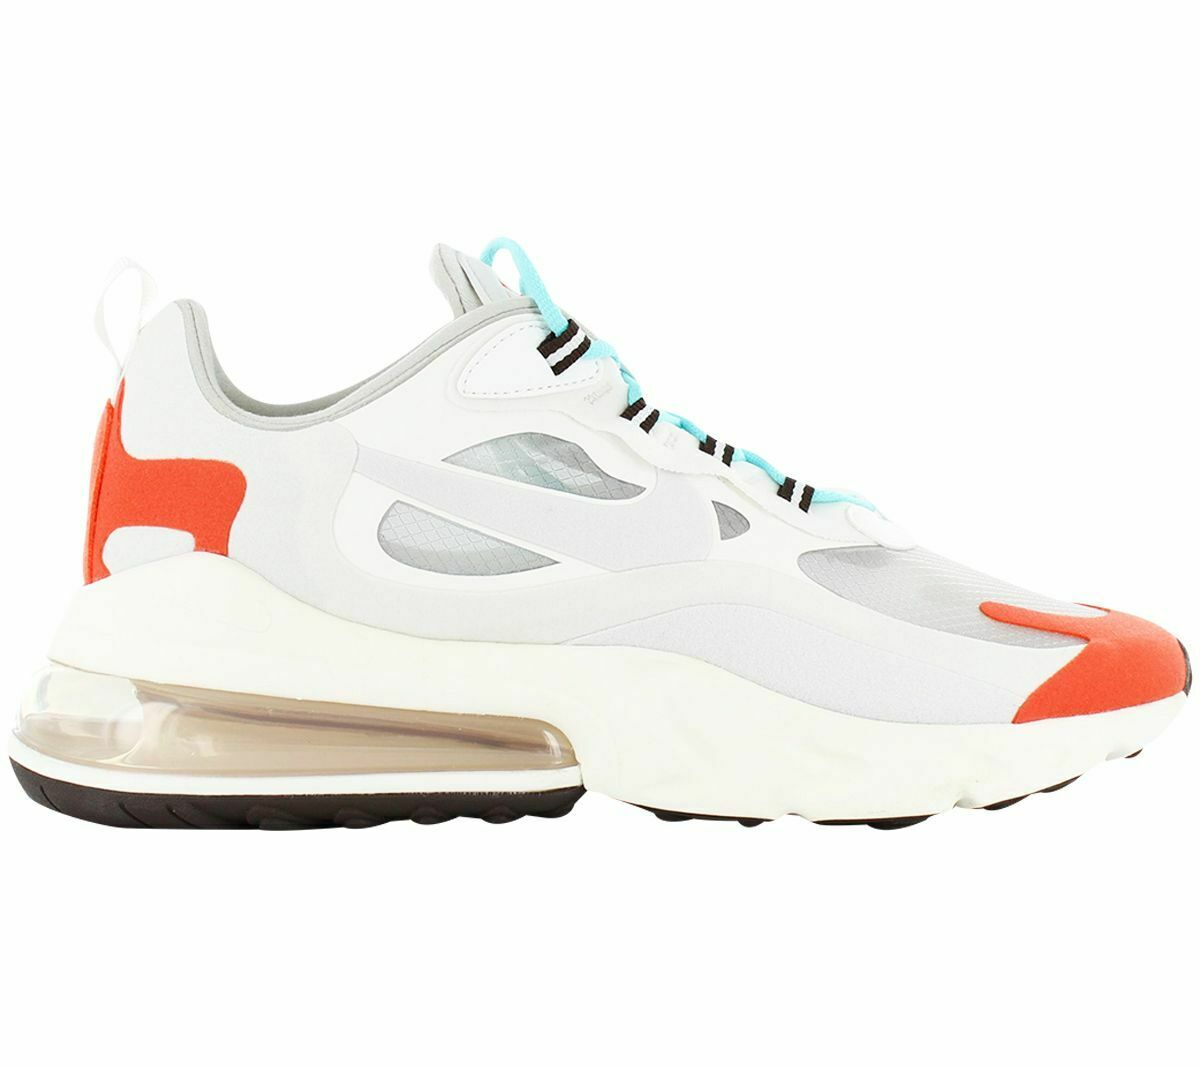 Nike Air Max 270 React - MID-CENTURY ART - AO4971-200 Herren Turnschuhe Schuhe NEU